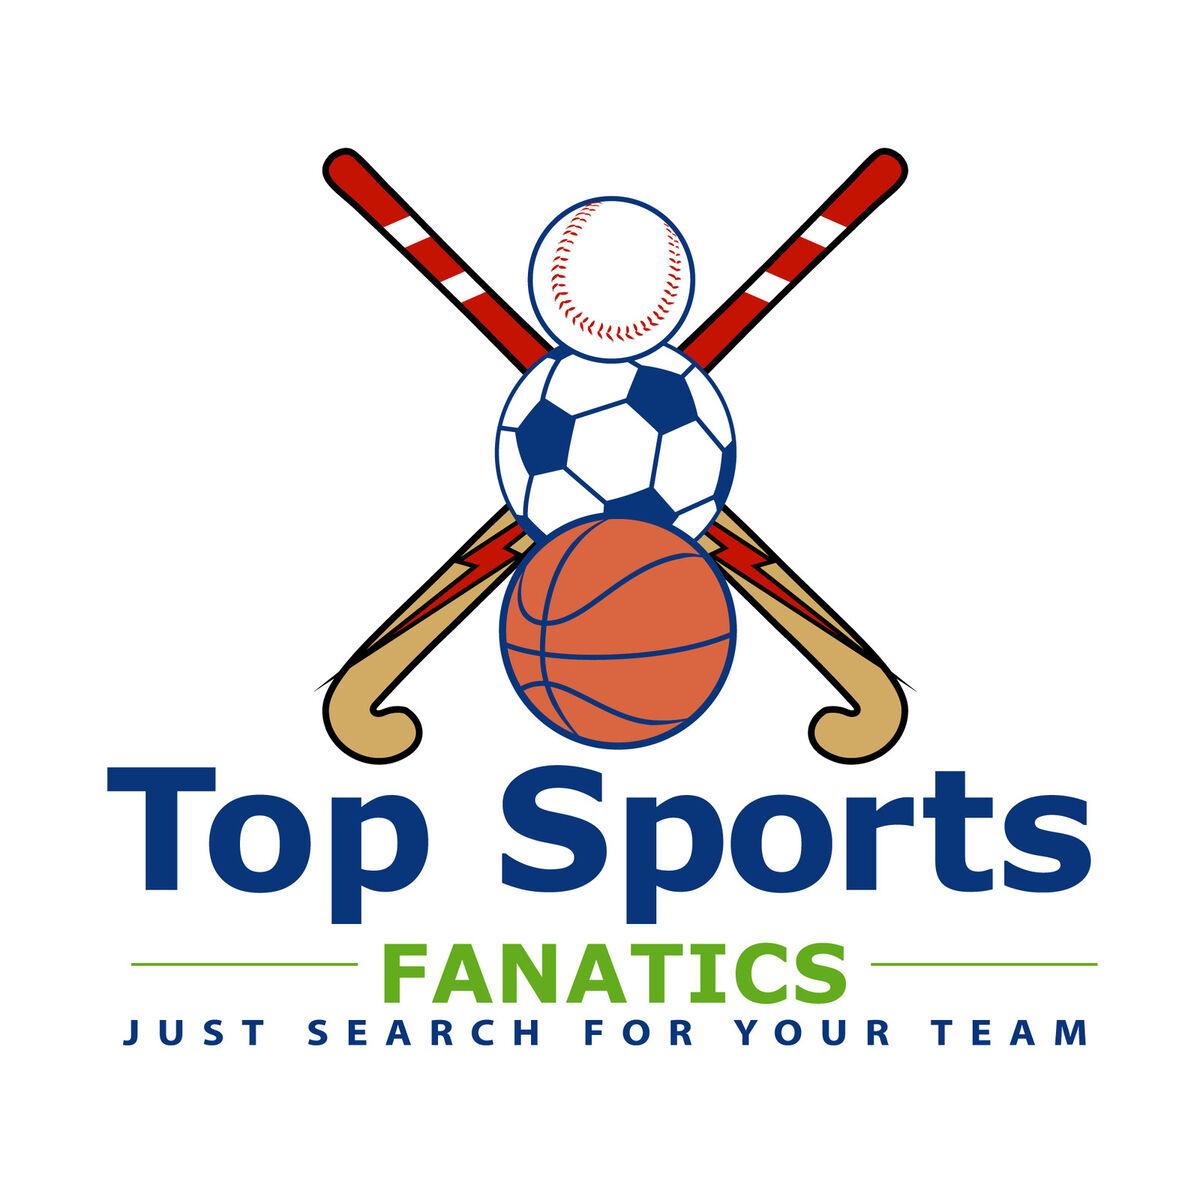 Top Sports Fanatics